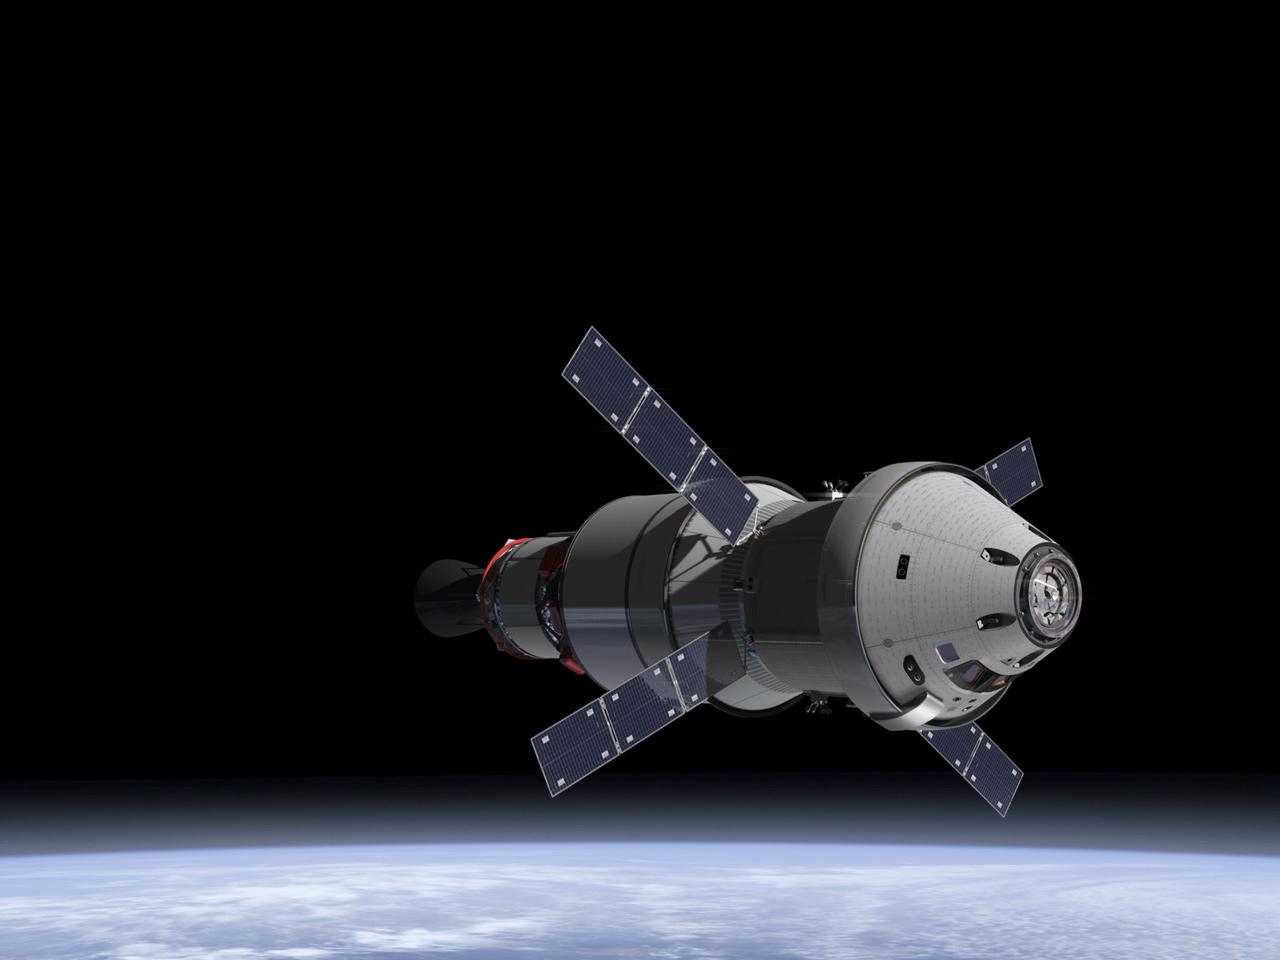 Orion_Service_Module.jpg